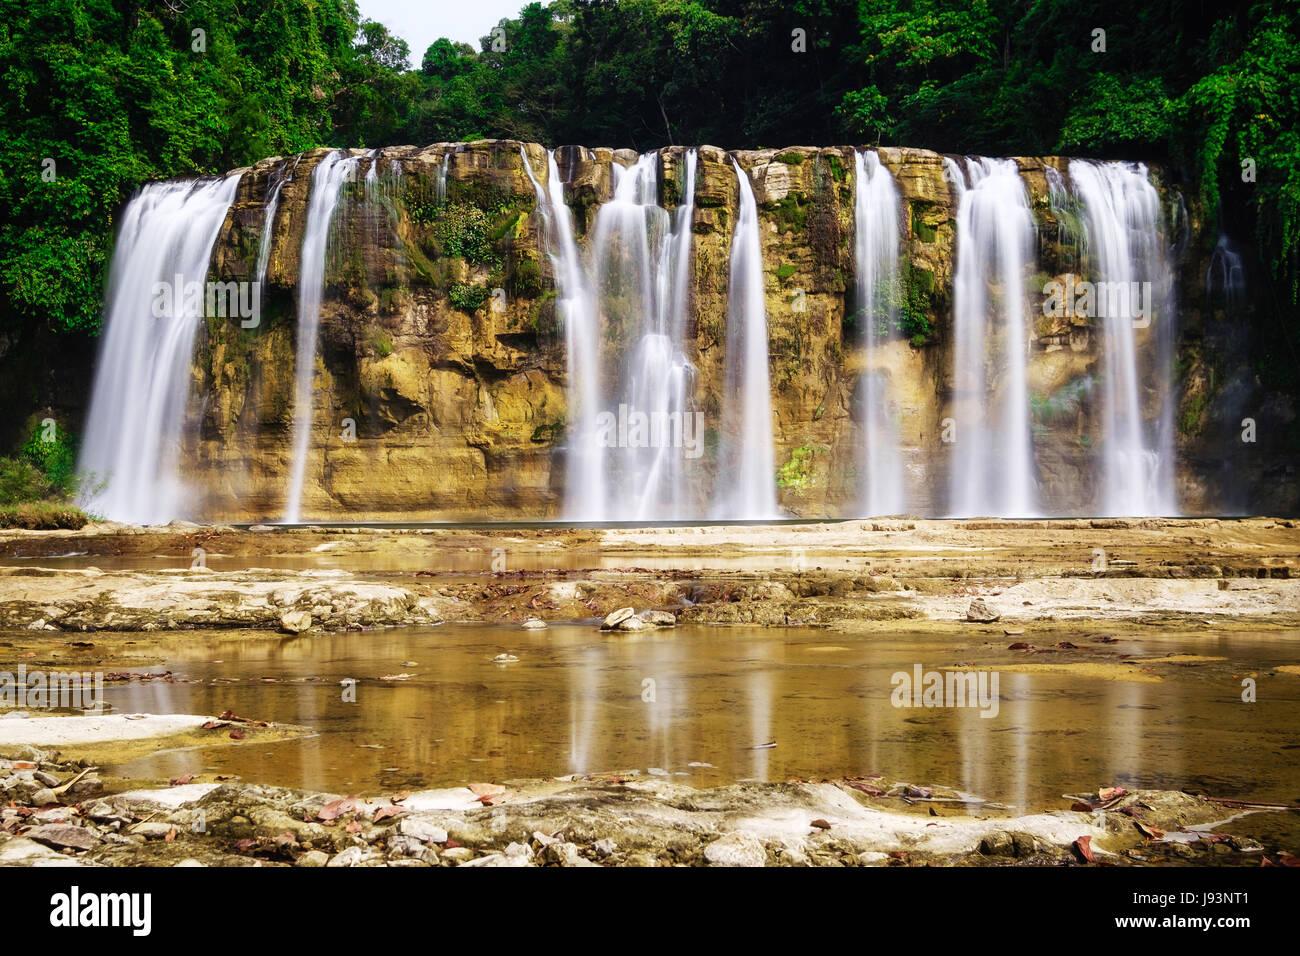 Tinuy An falls also known as mini Niagara falls - Stock Image